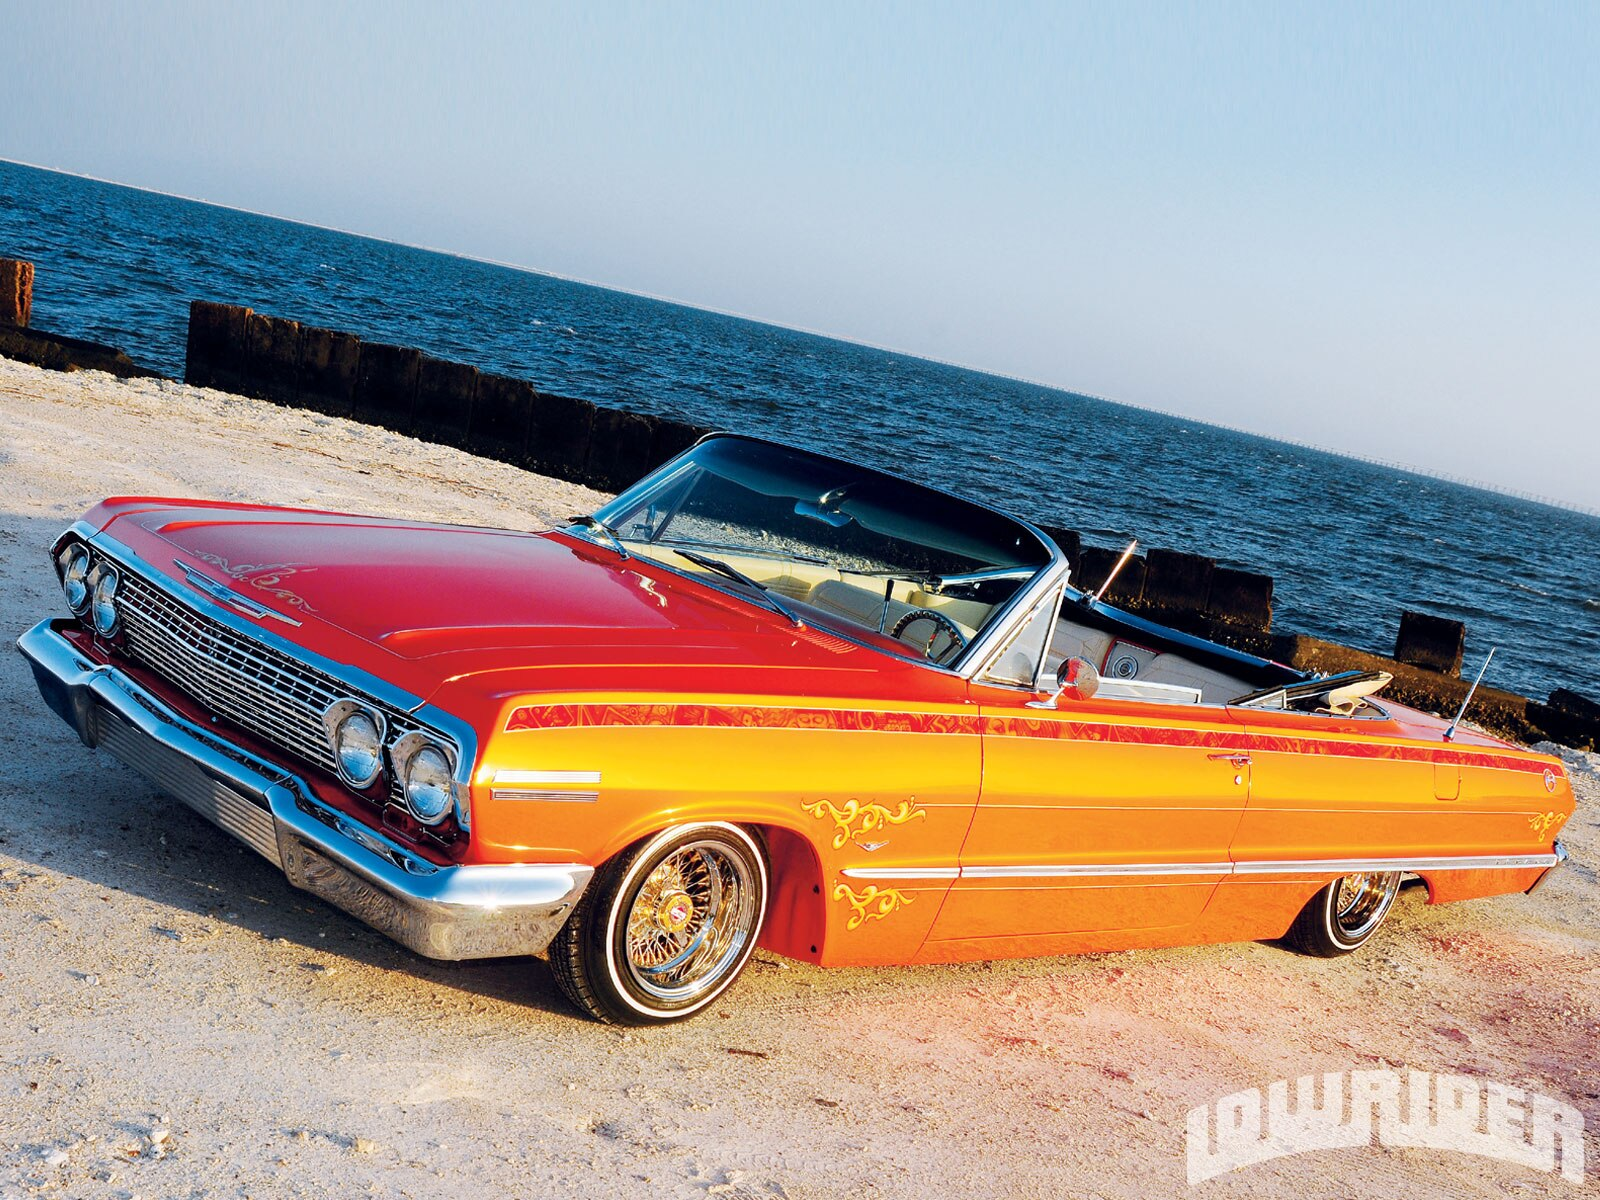 lrmp-1012-01-o-1963-chevrolet-impala-front-view3